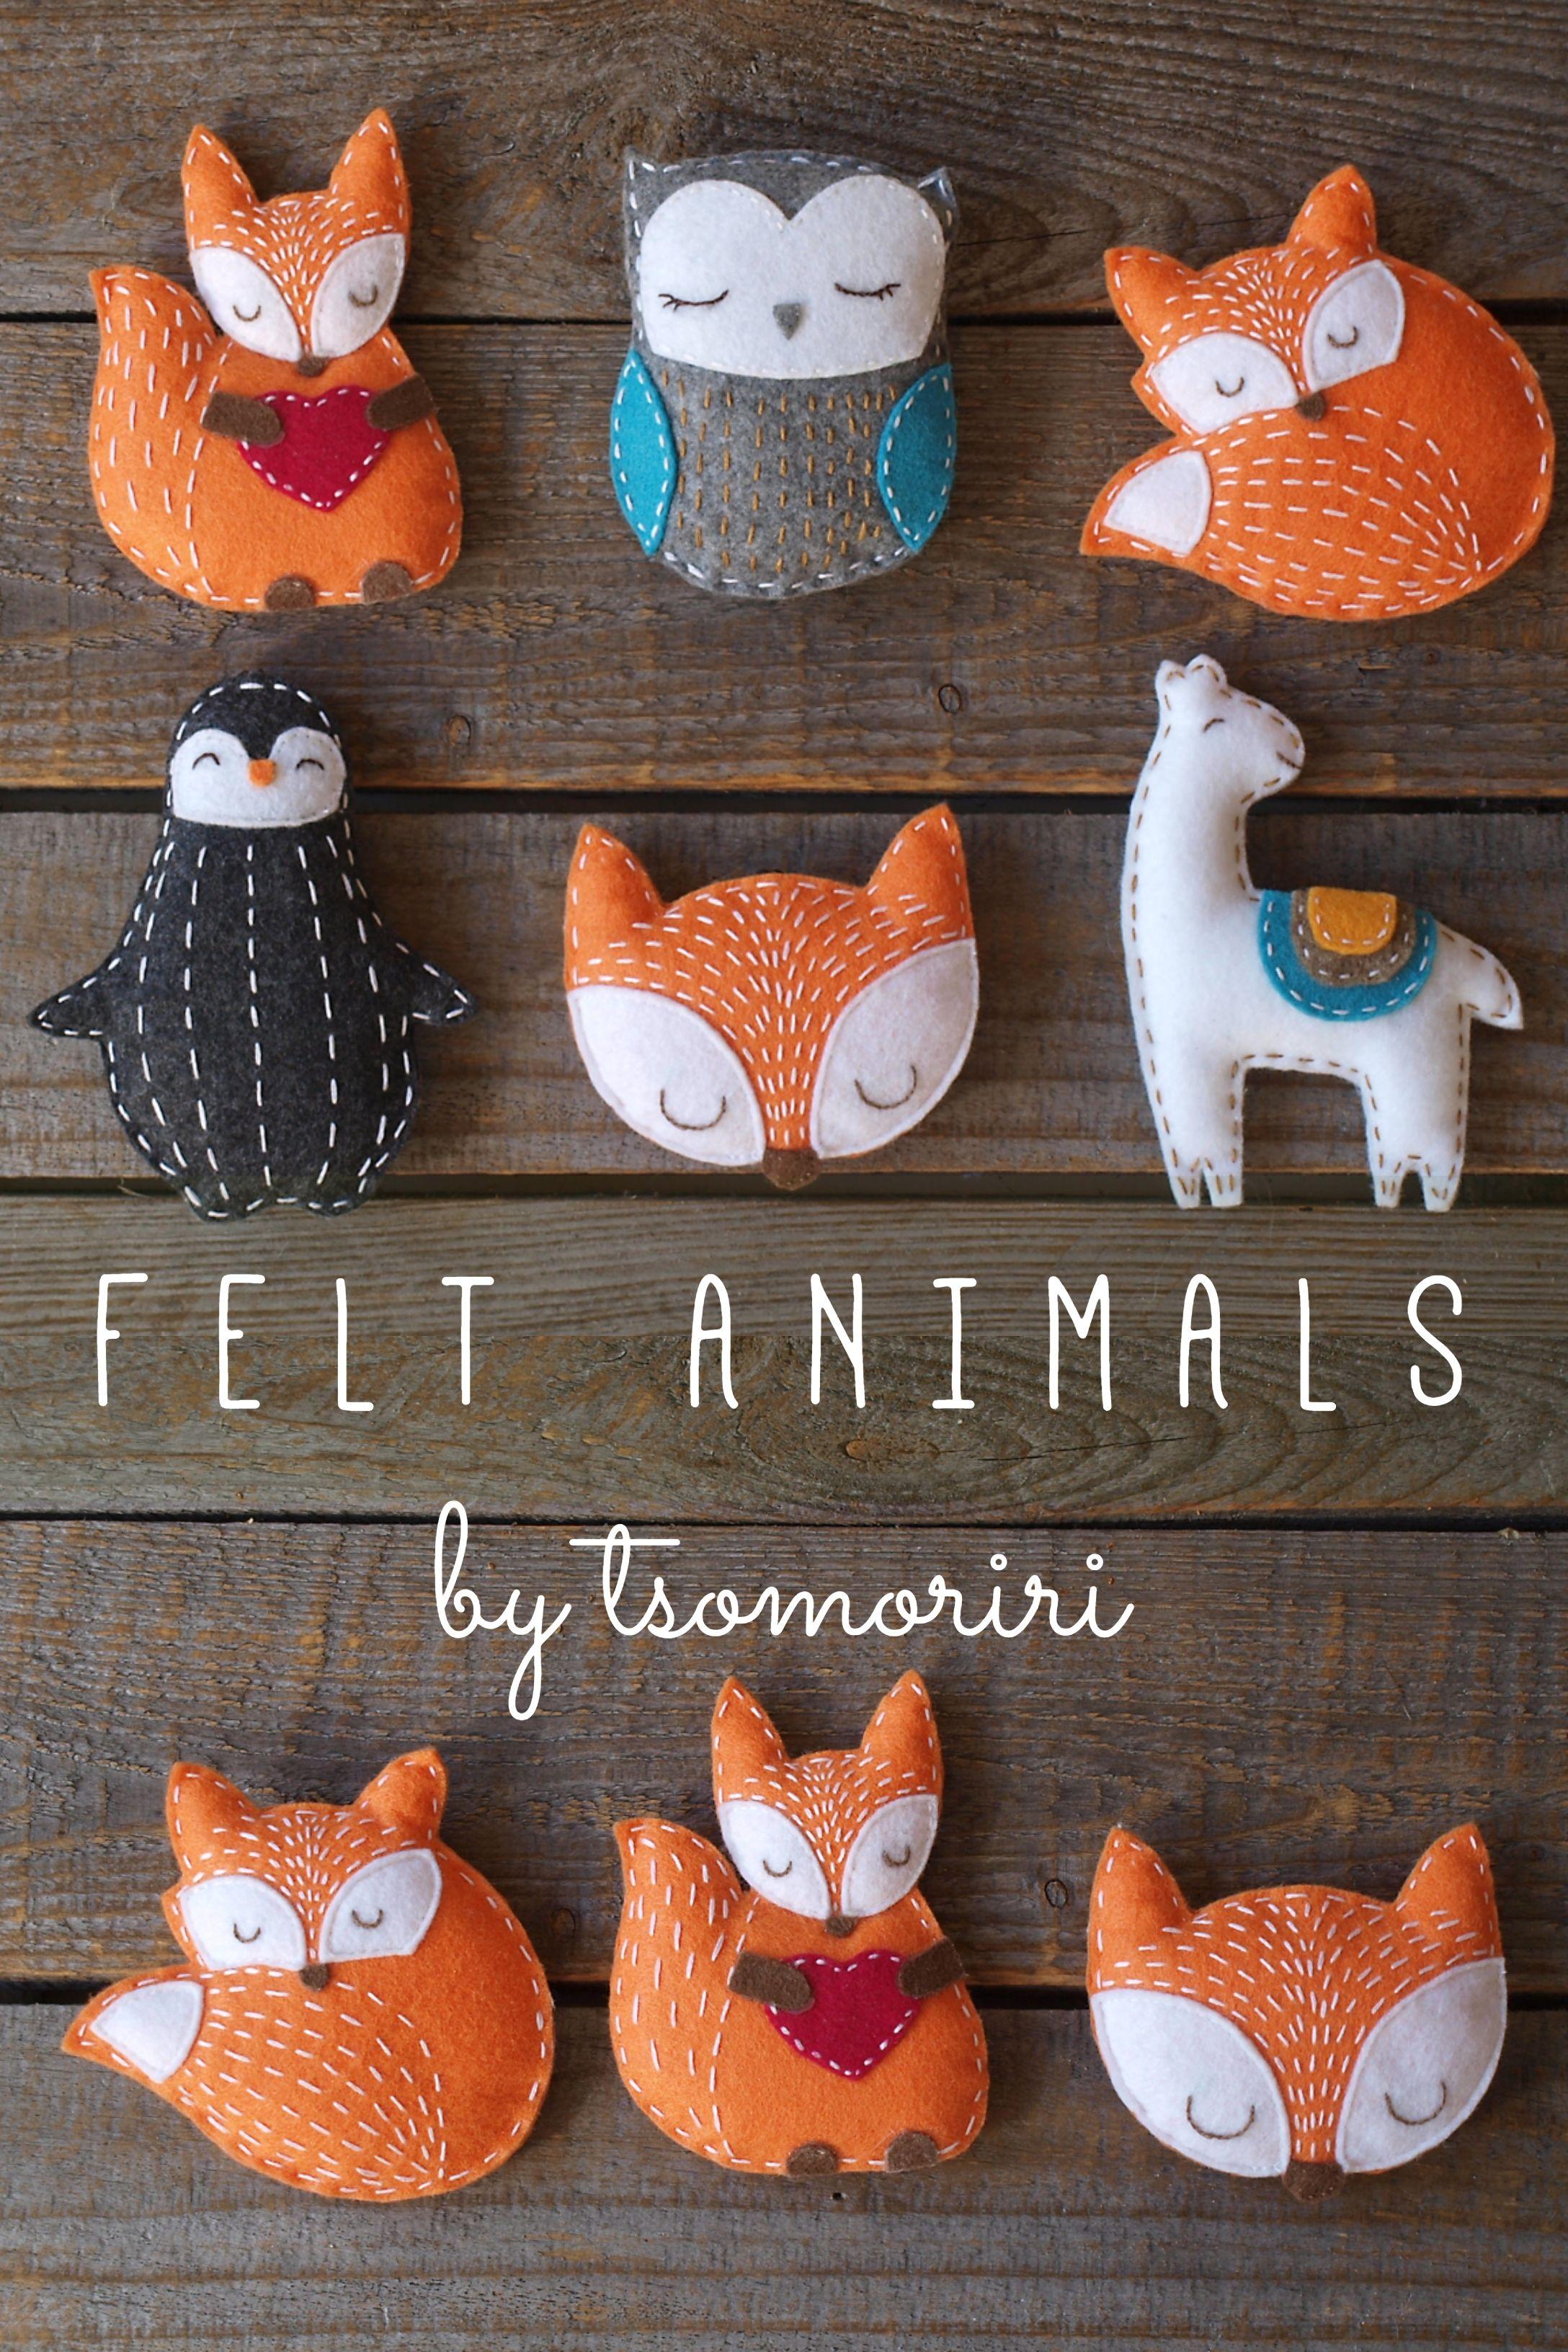 Felt Miniature Animals Felt Crafts Diy Felt Crafts Felt Christmas Ornaments